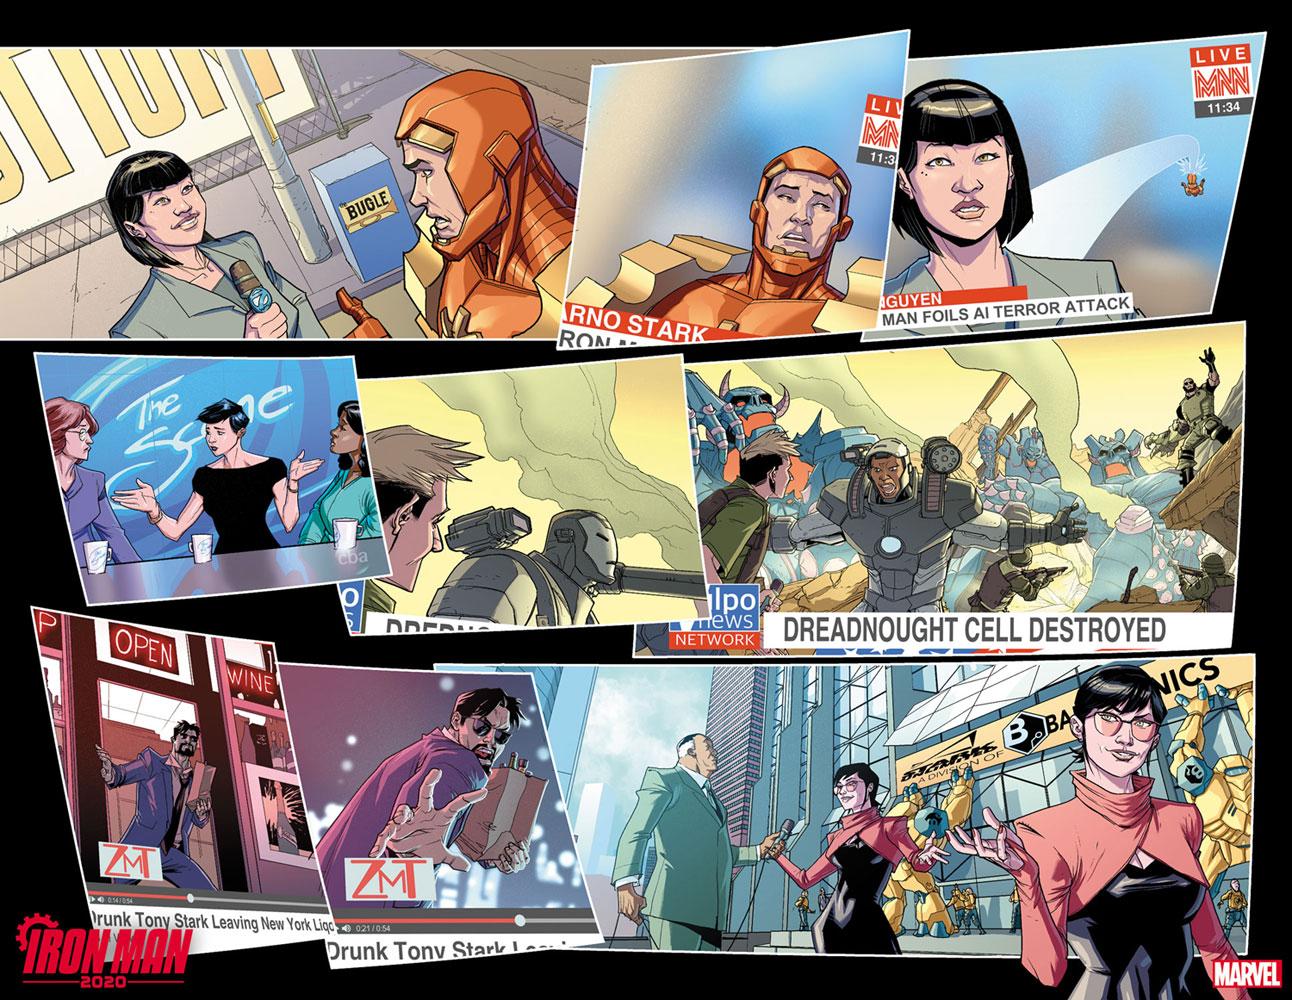 Iron Man 2020 #1 (incentive 1:25 cover - Khoi Pham)  [2020] - Marvel Comics